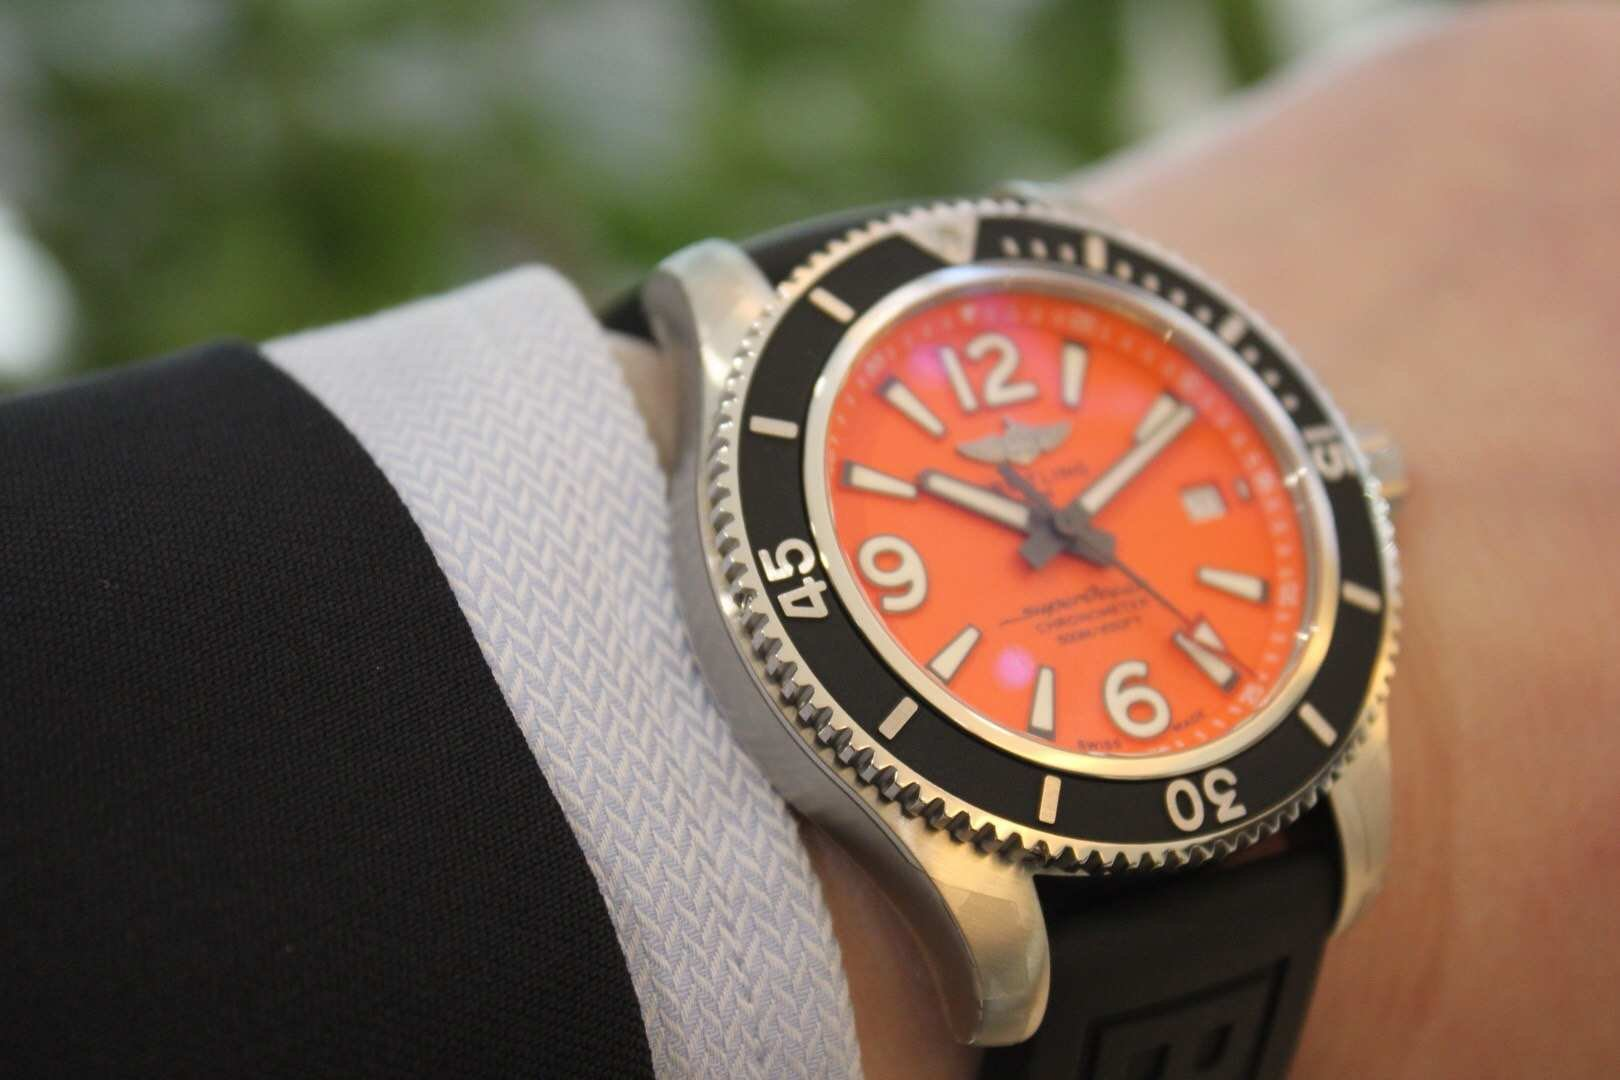 BREITLING百年灵Superoean超级海洋系列,潜水员专业潜水腕表插图2